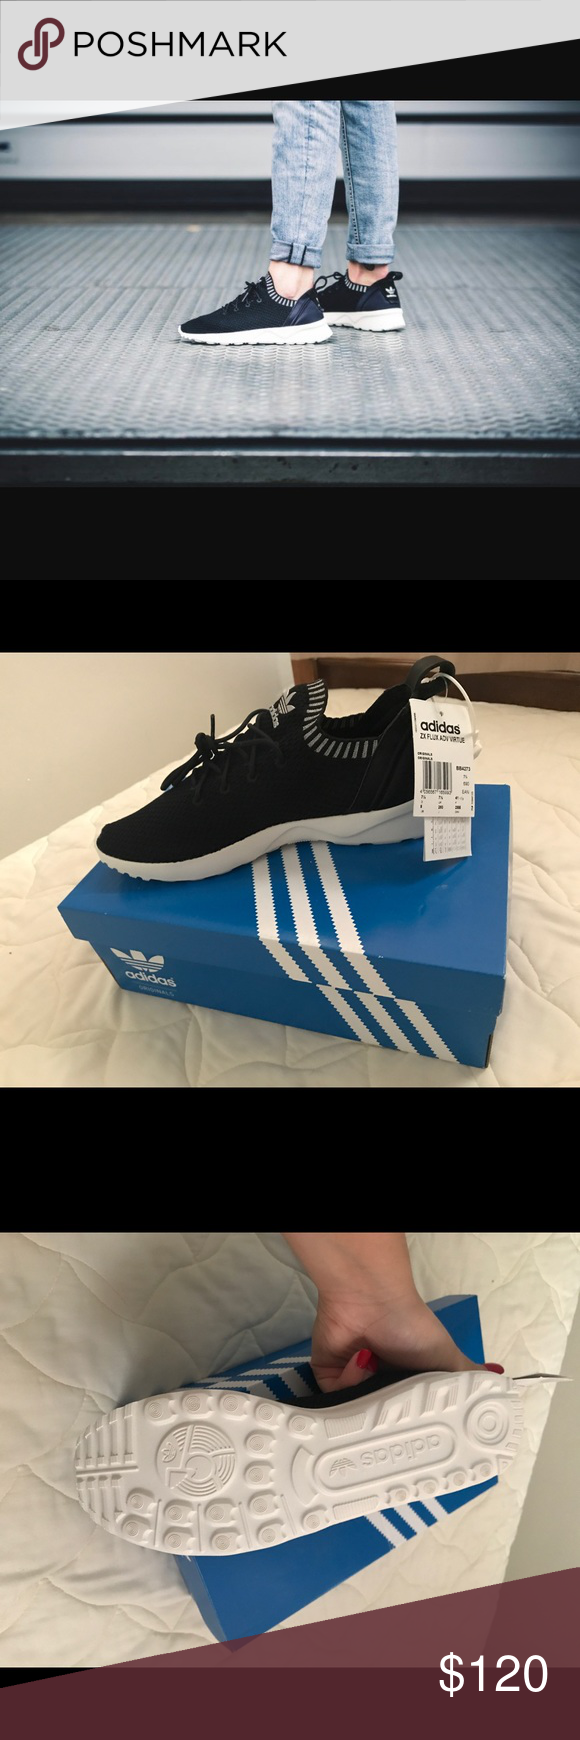 adidas scarpe nuove adidas zx flusso avanzata corrisponde a